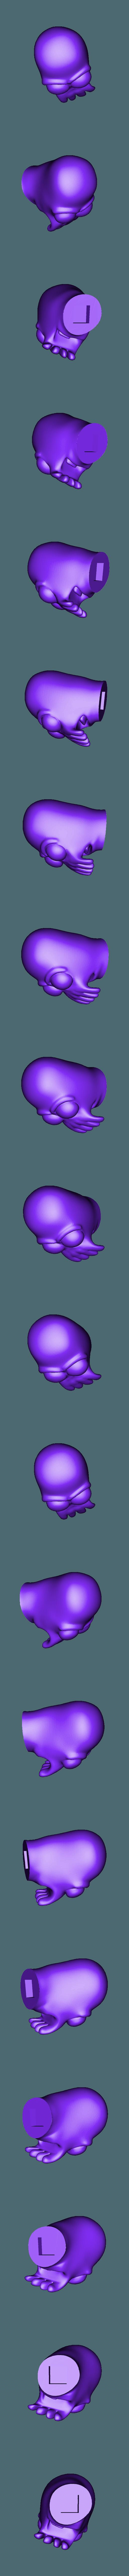 cabeza.stl Télécharger fichier STL Zoidberg de Futurama • Design pour impression 3D, EugenioFructuoso